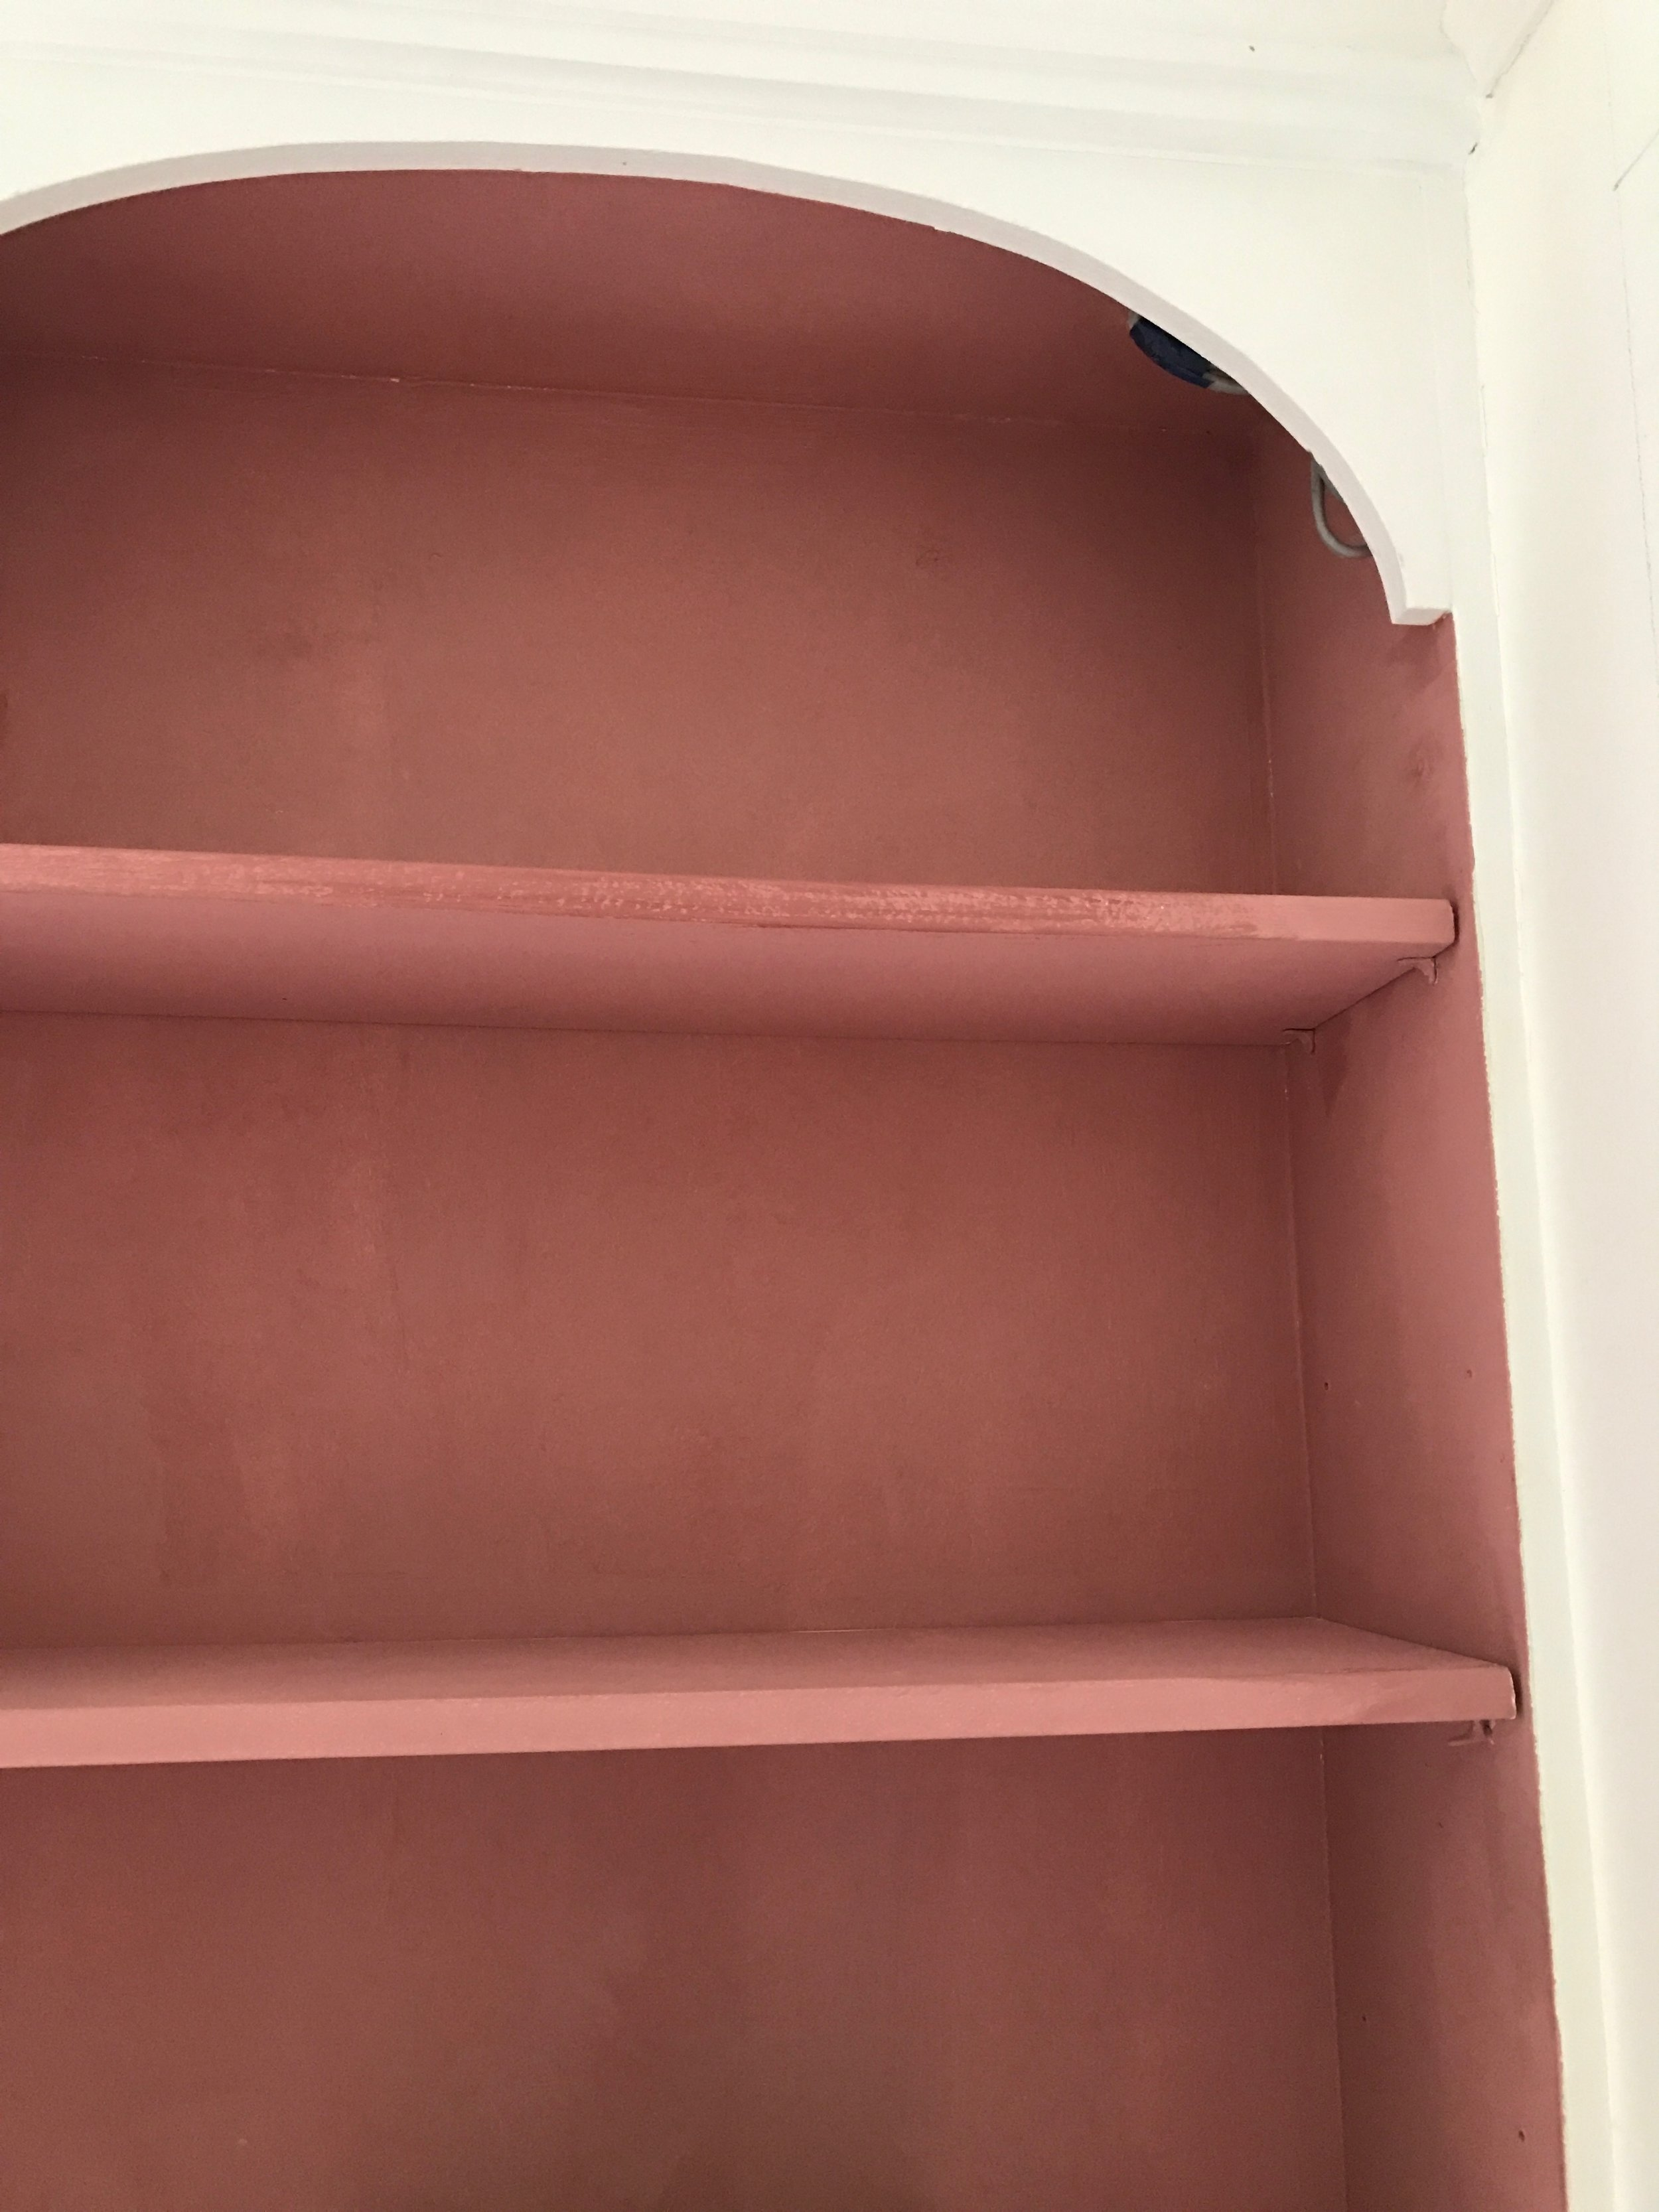 Camilla Pearl home interior image - terracotta shades for home colour inspiration.